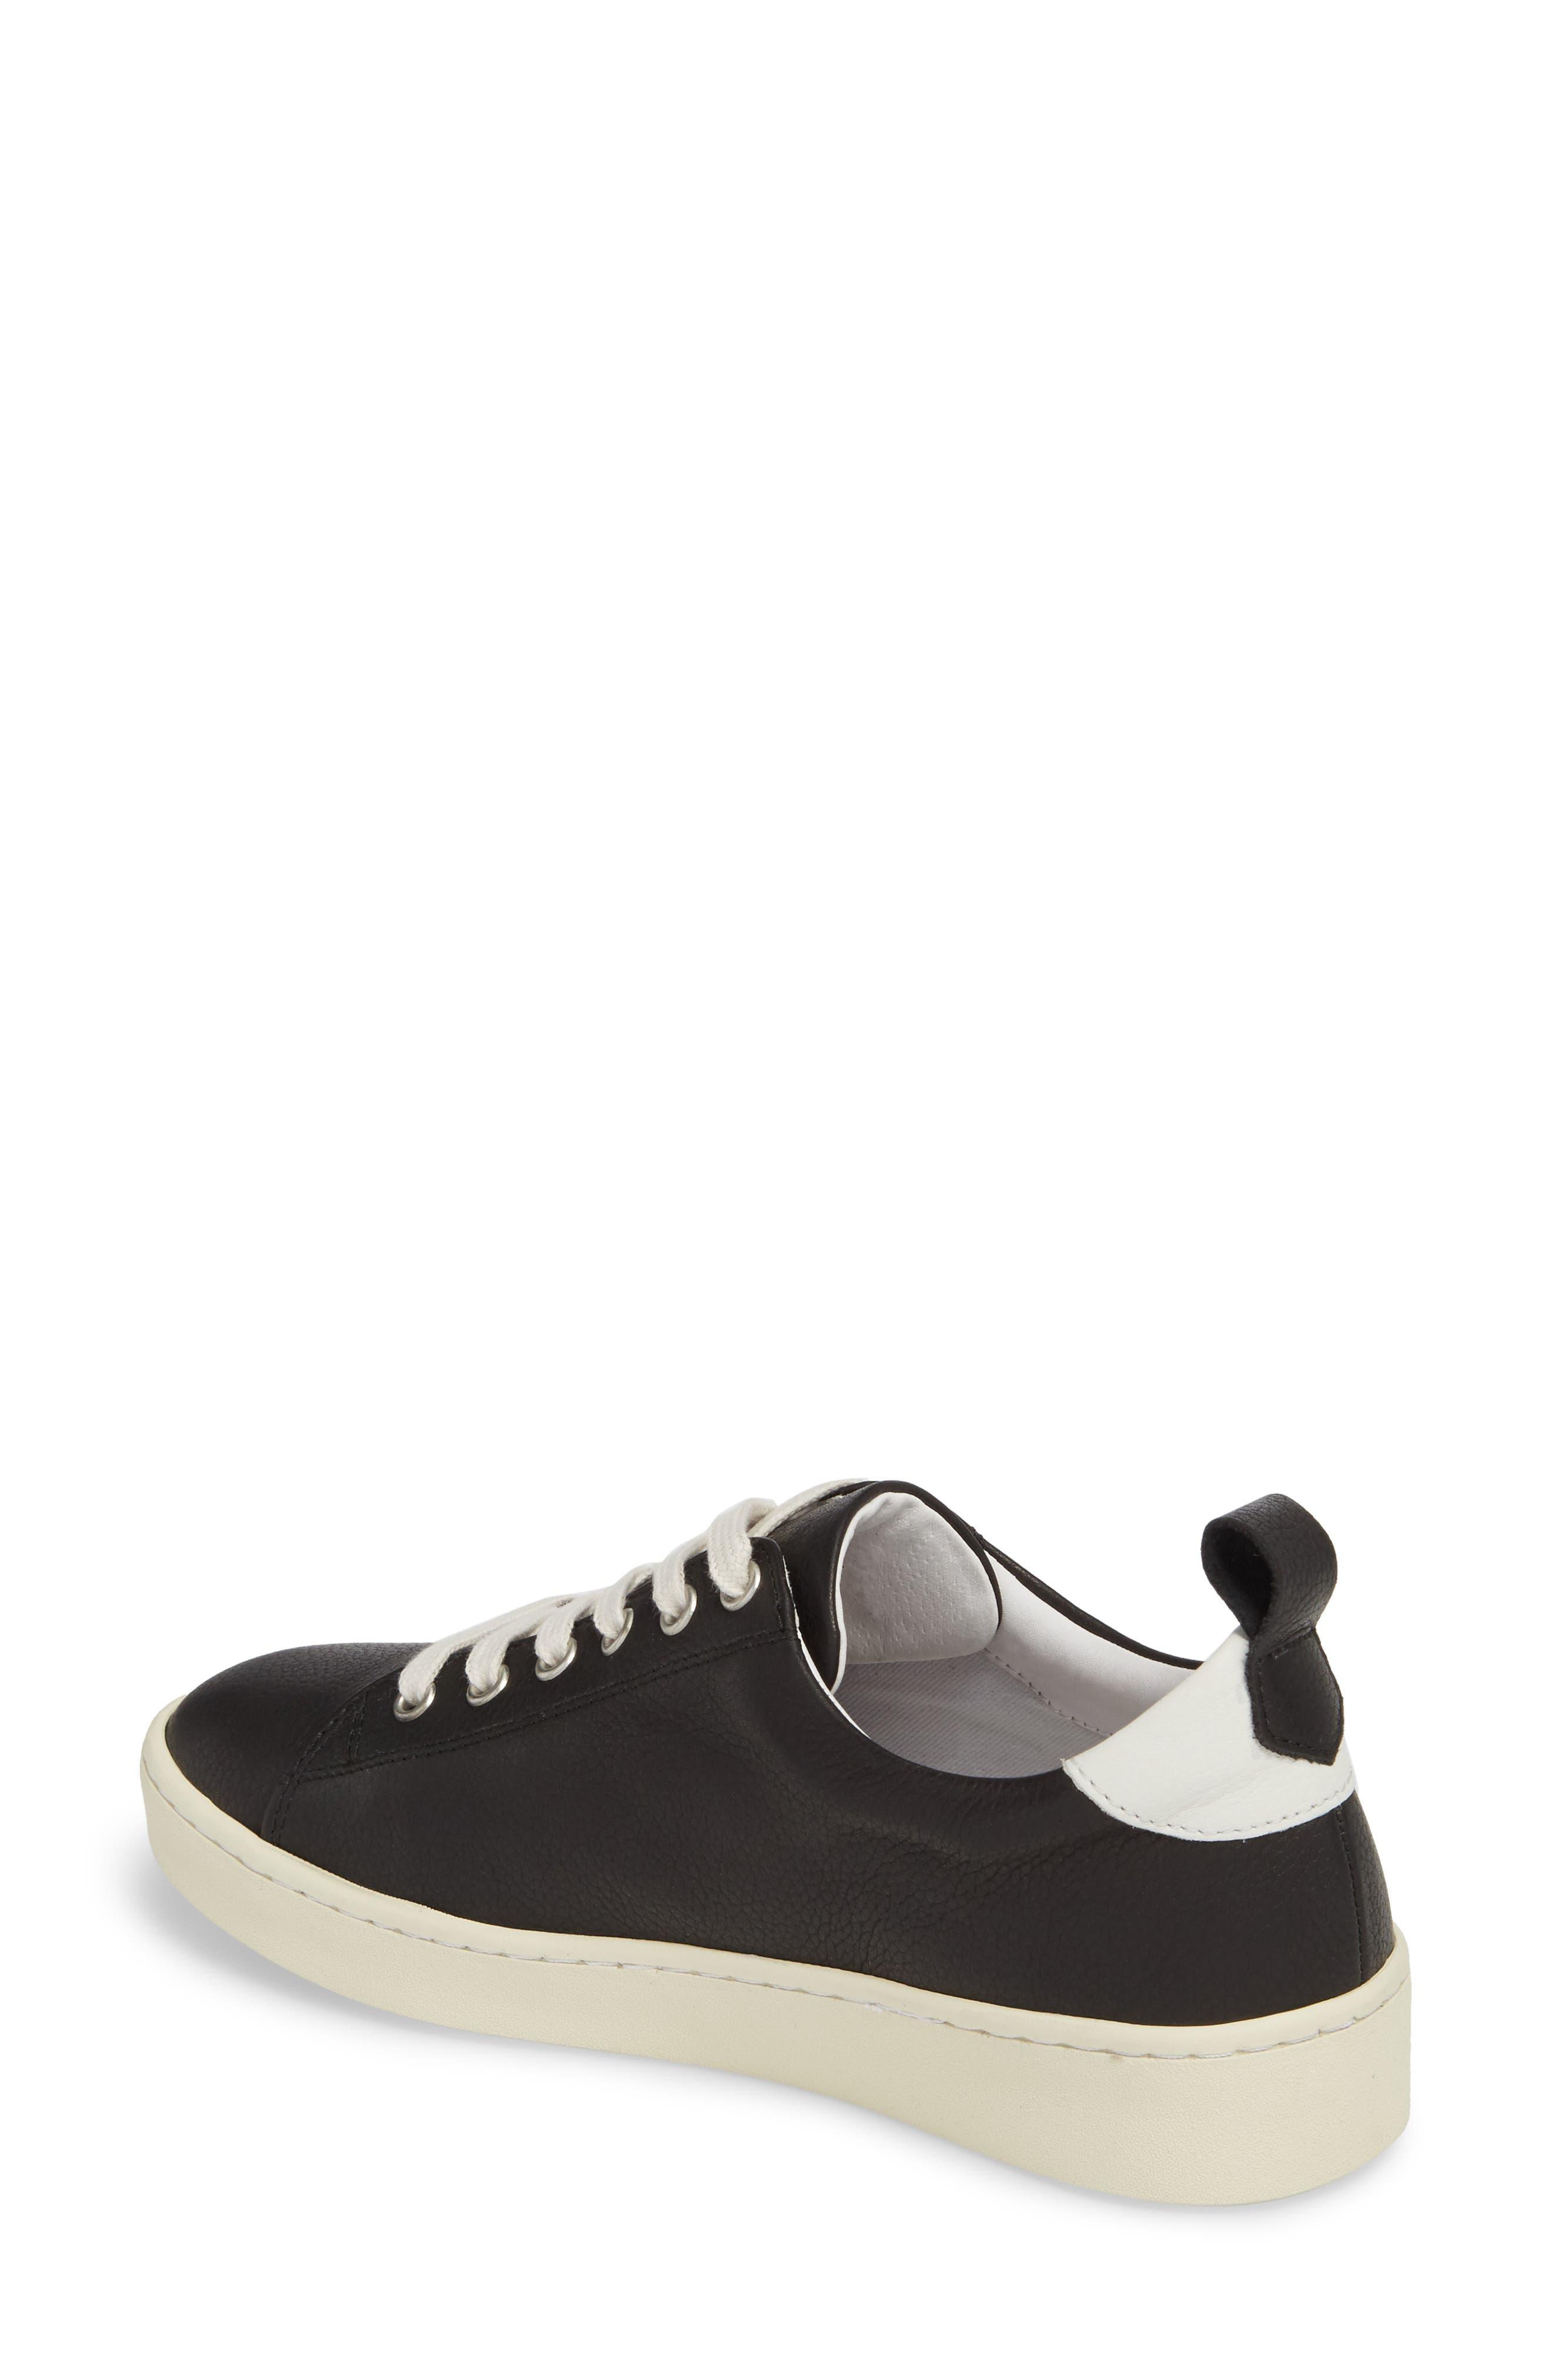 Maku Lace-Up Sneaker,                             Alternate thumbnail 2, color,                             BLACK BRITO LEATHER